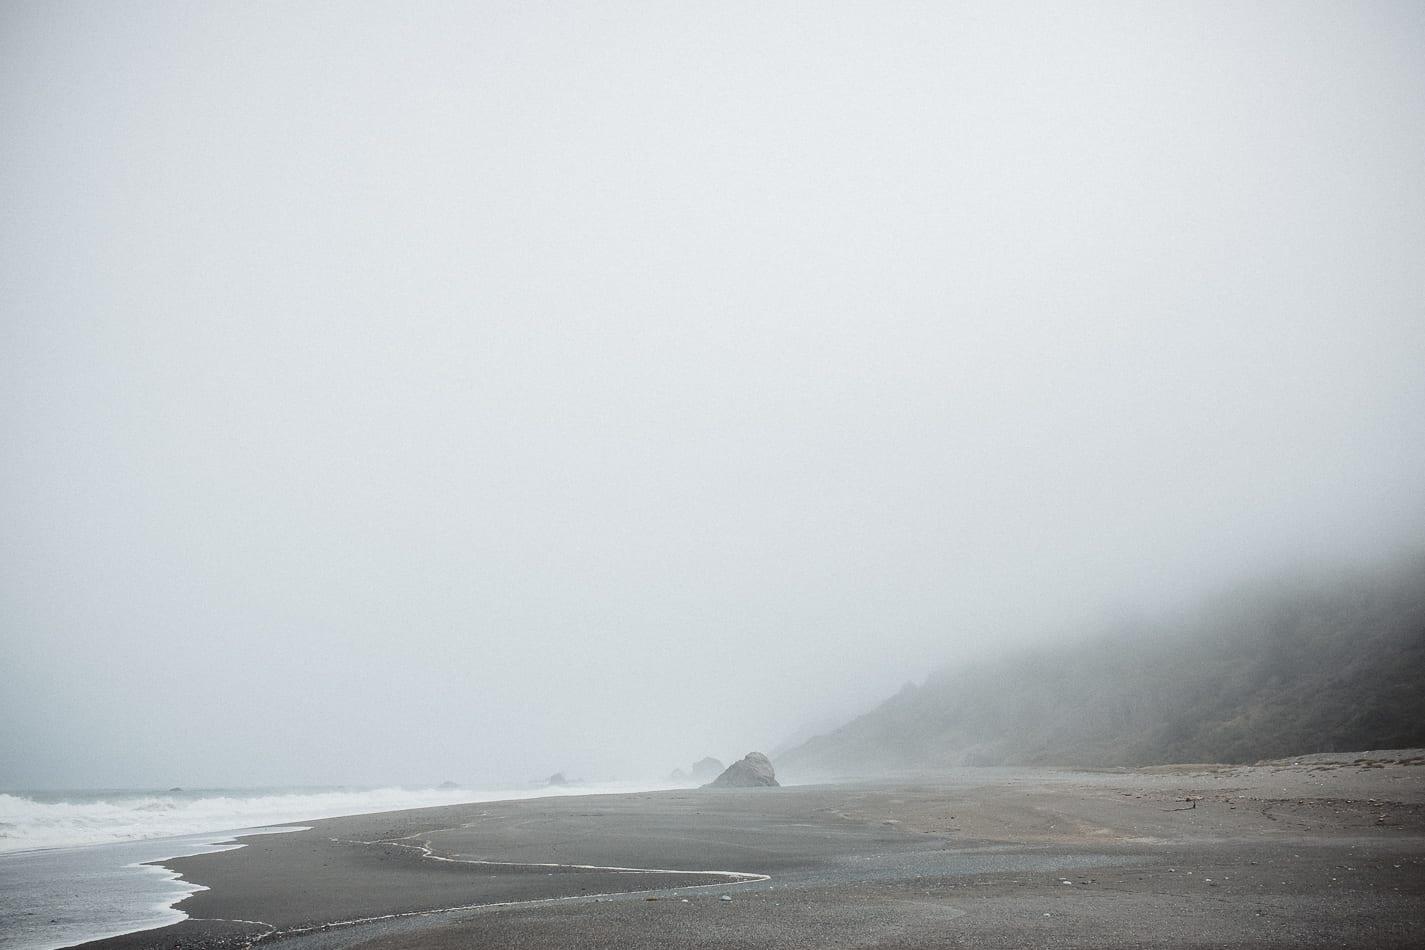 patricks-point-beach-camping-california-adventure-photographer-12